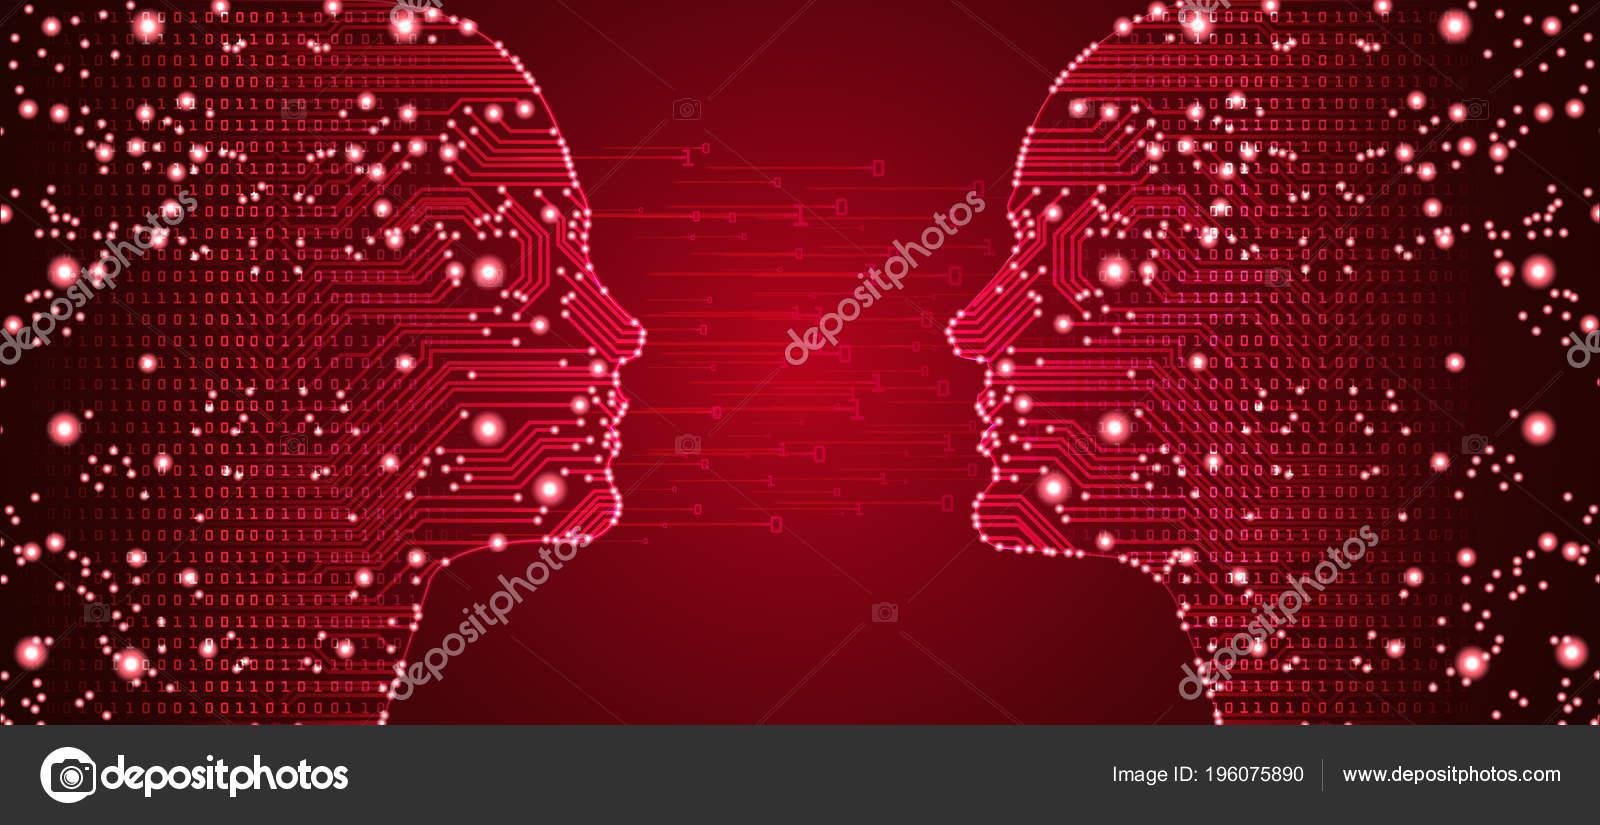 Kohtalo online dating